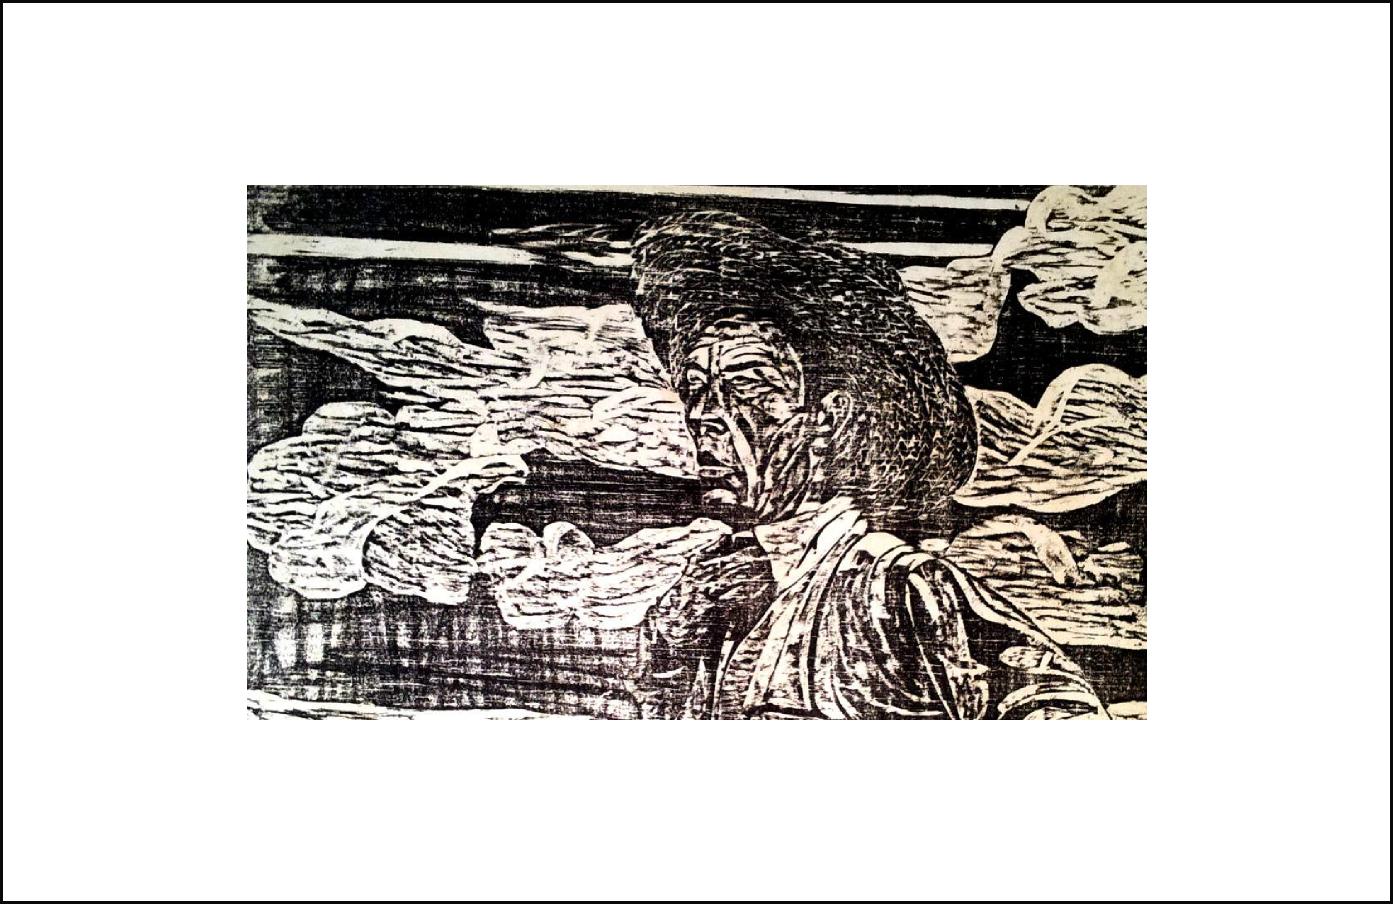 Xilografía de Cristóbal Aguilar